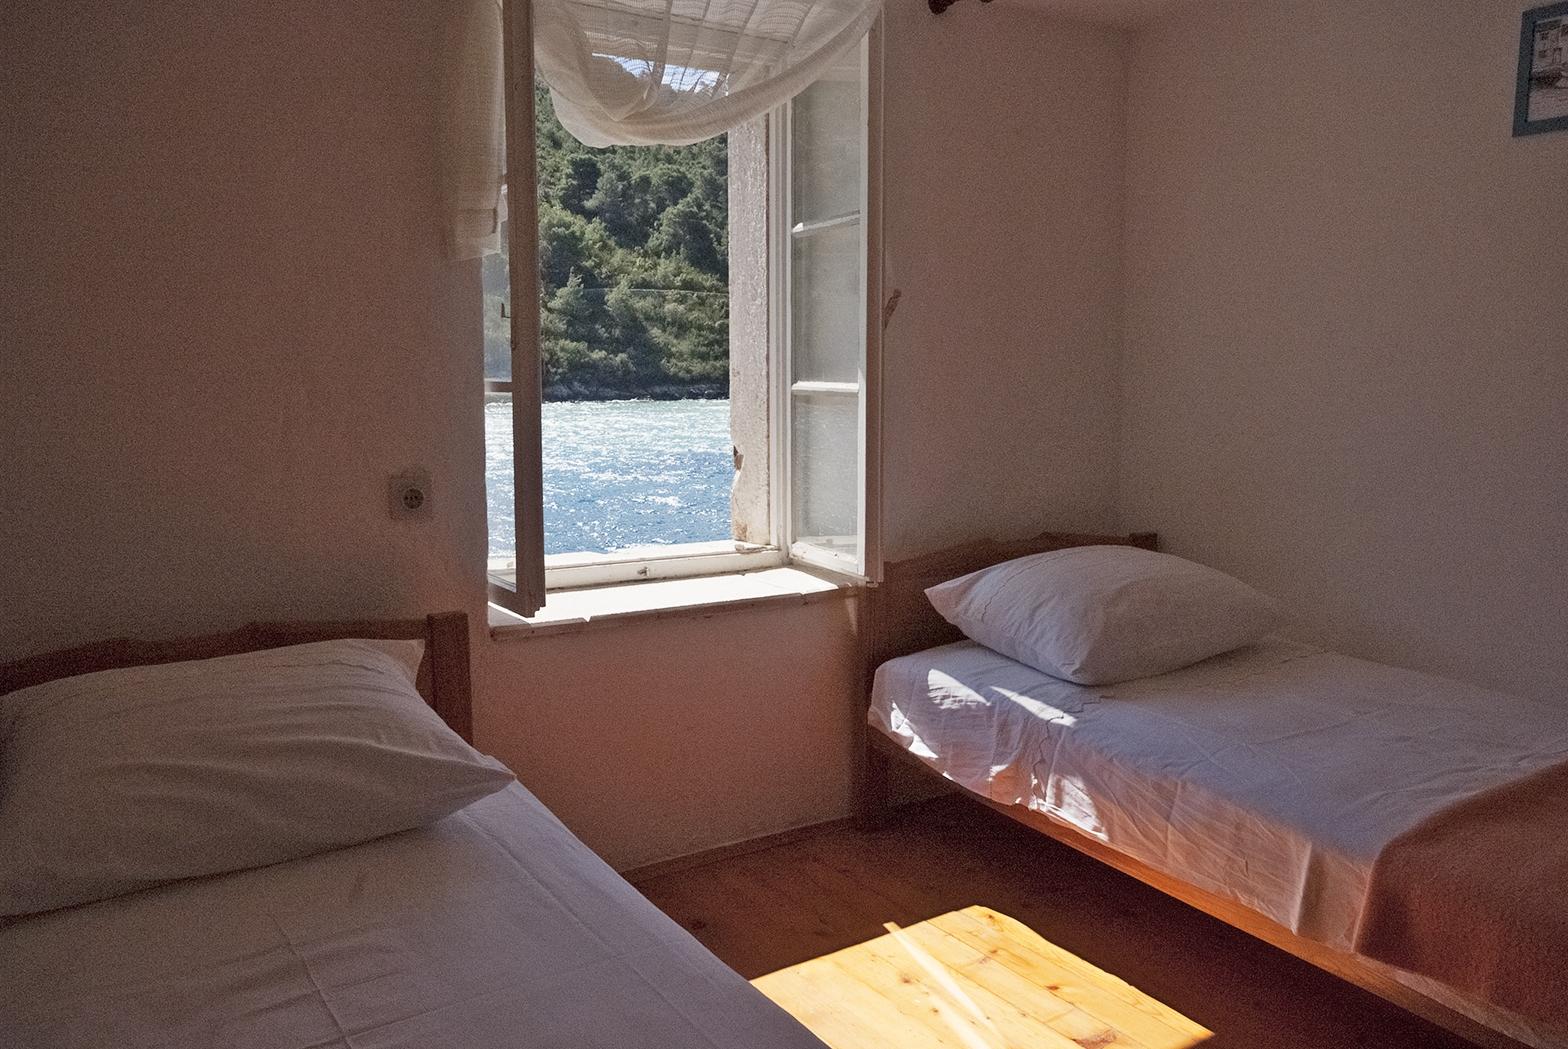 IL - Baai Stoncica (Vis) - Vakantiehuizen, villa´s Kroatië - H(7): slaapkamer